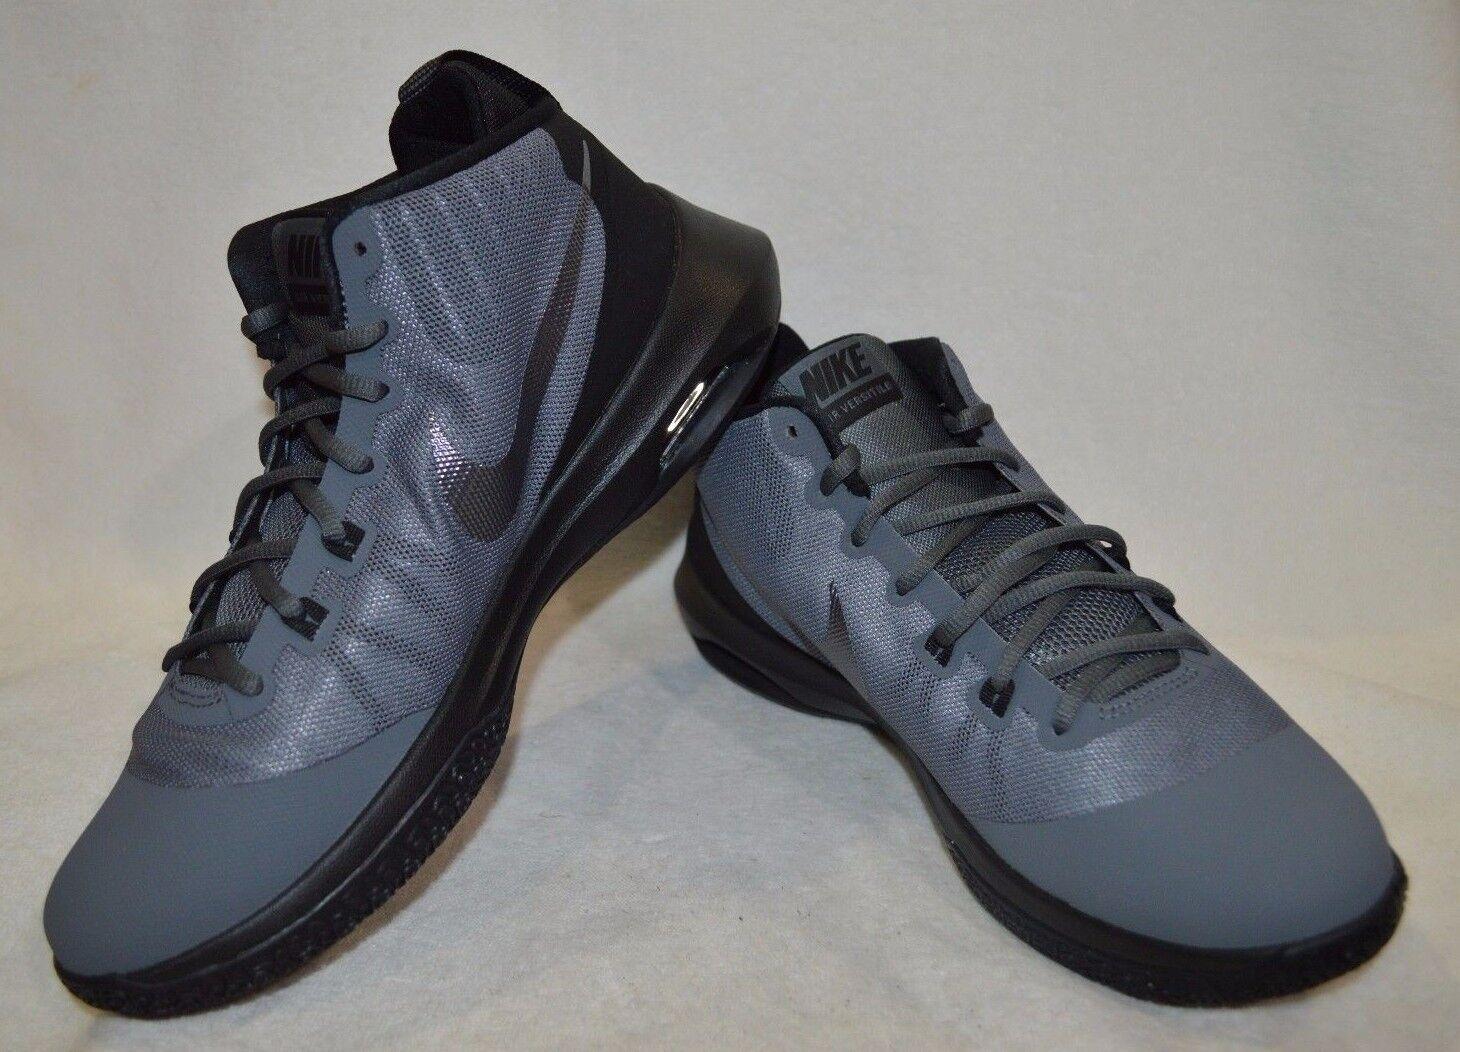 Versitile NBK Negro/Nike Air Dk Gris De Hombre Zapatos De De Zapatos Baloncesto-tamaños surtidos Nueva con caja ce52b3